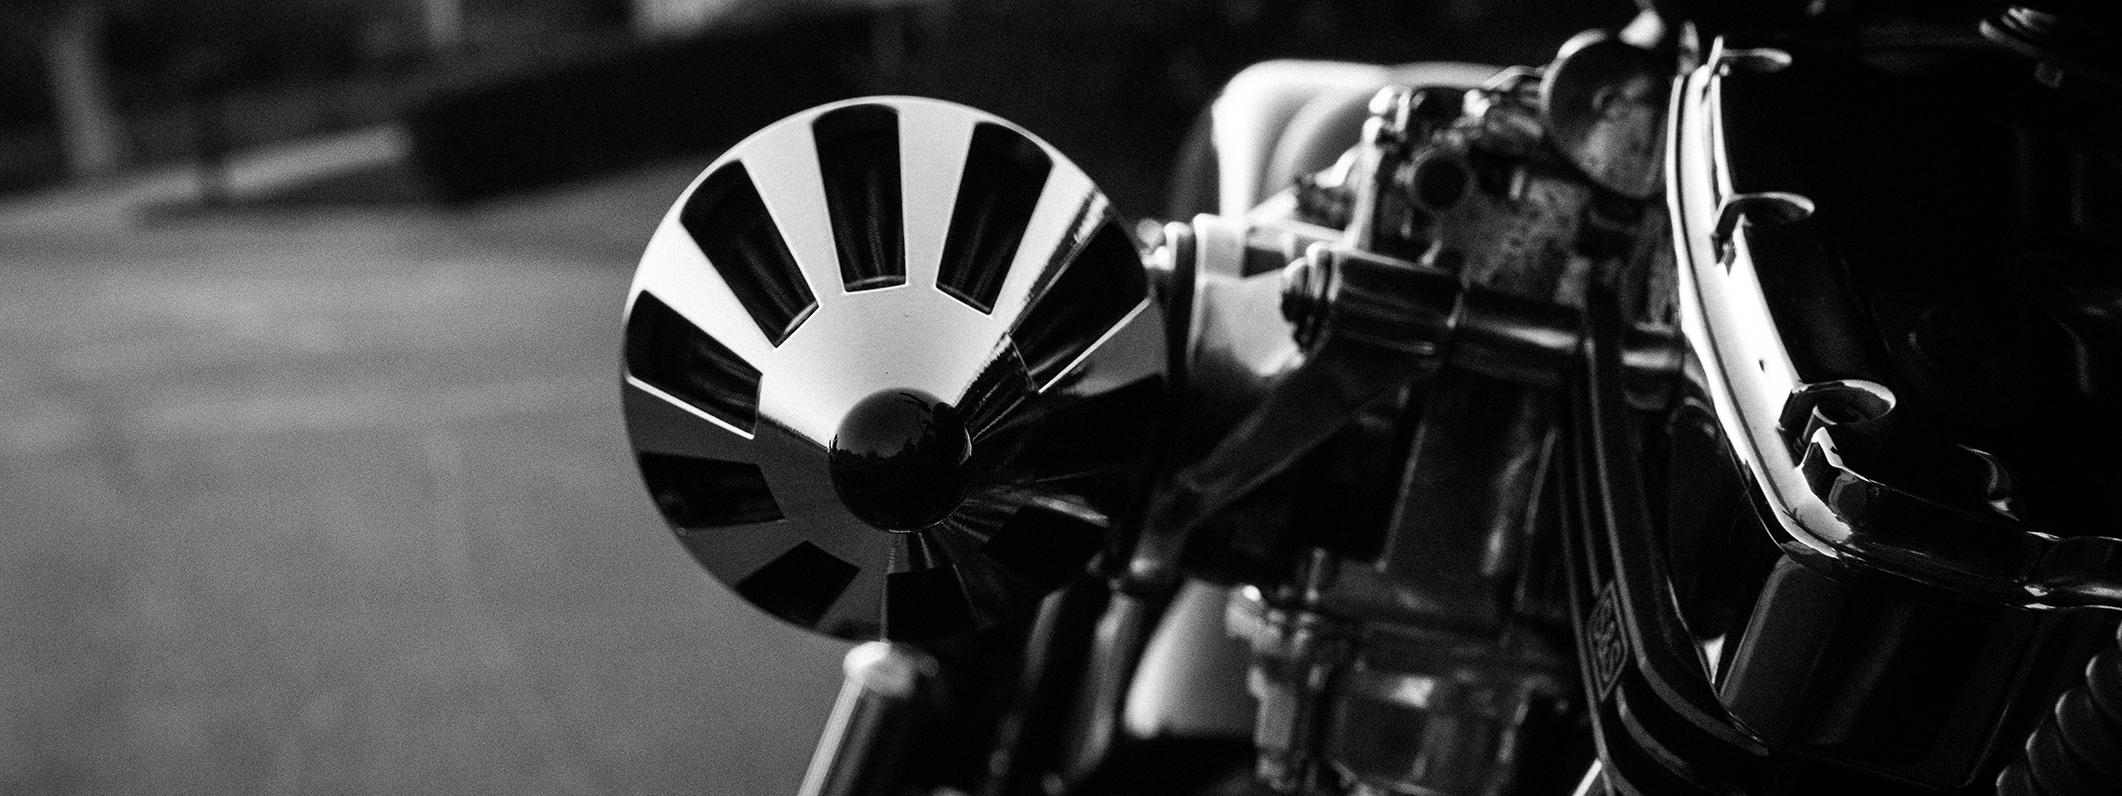 Kaiserbuilt Motorcycles